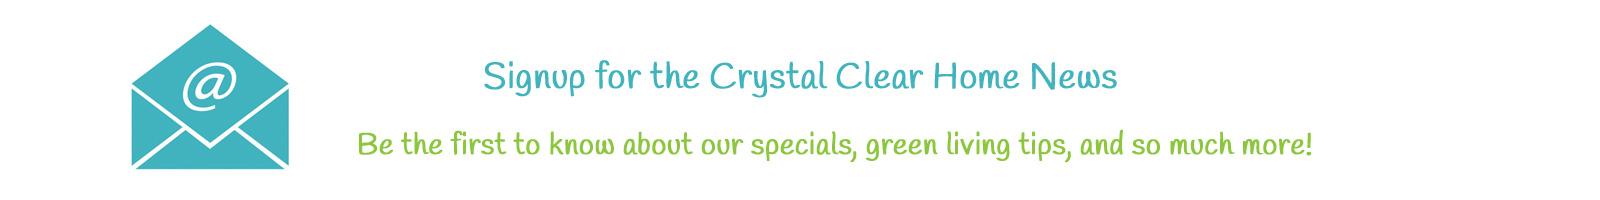 Crystal Clear Home News